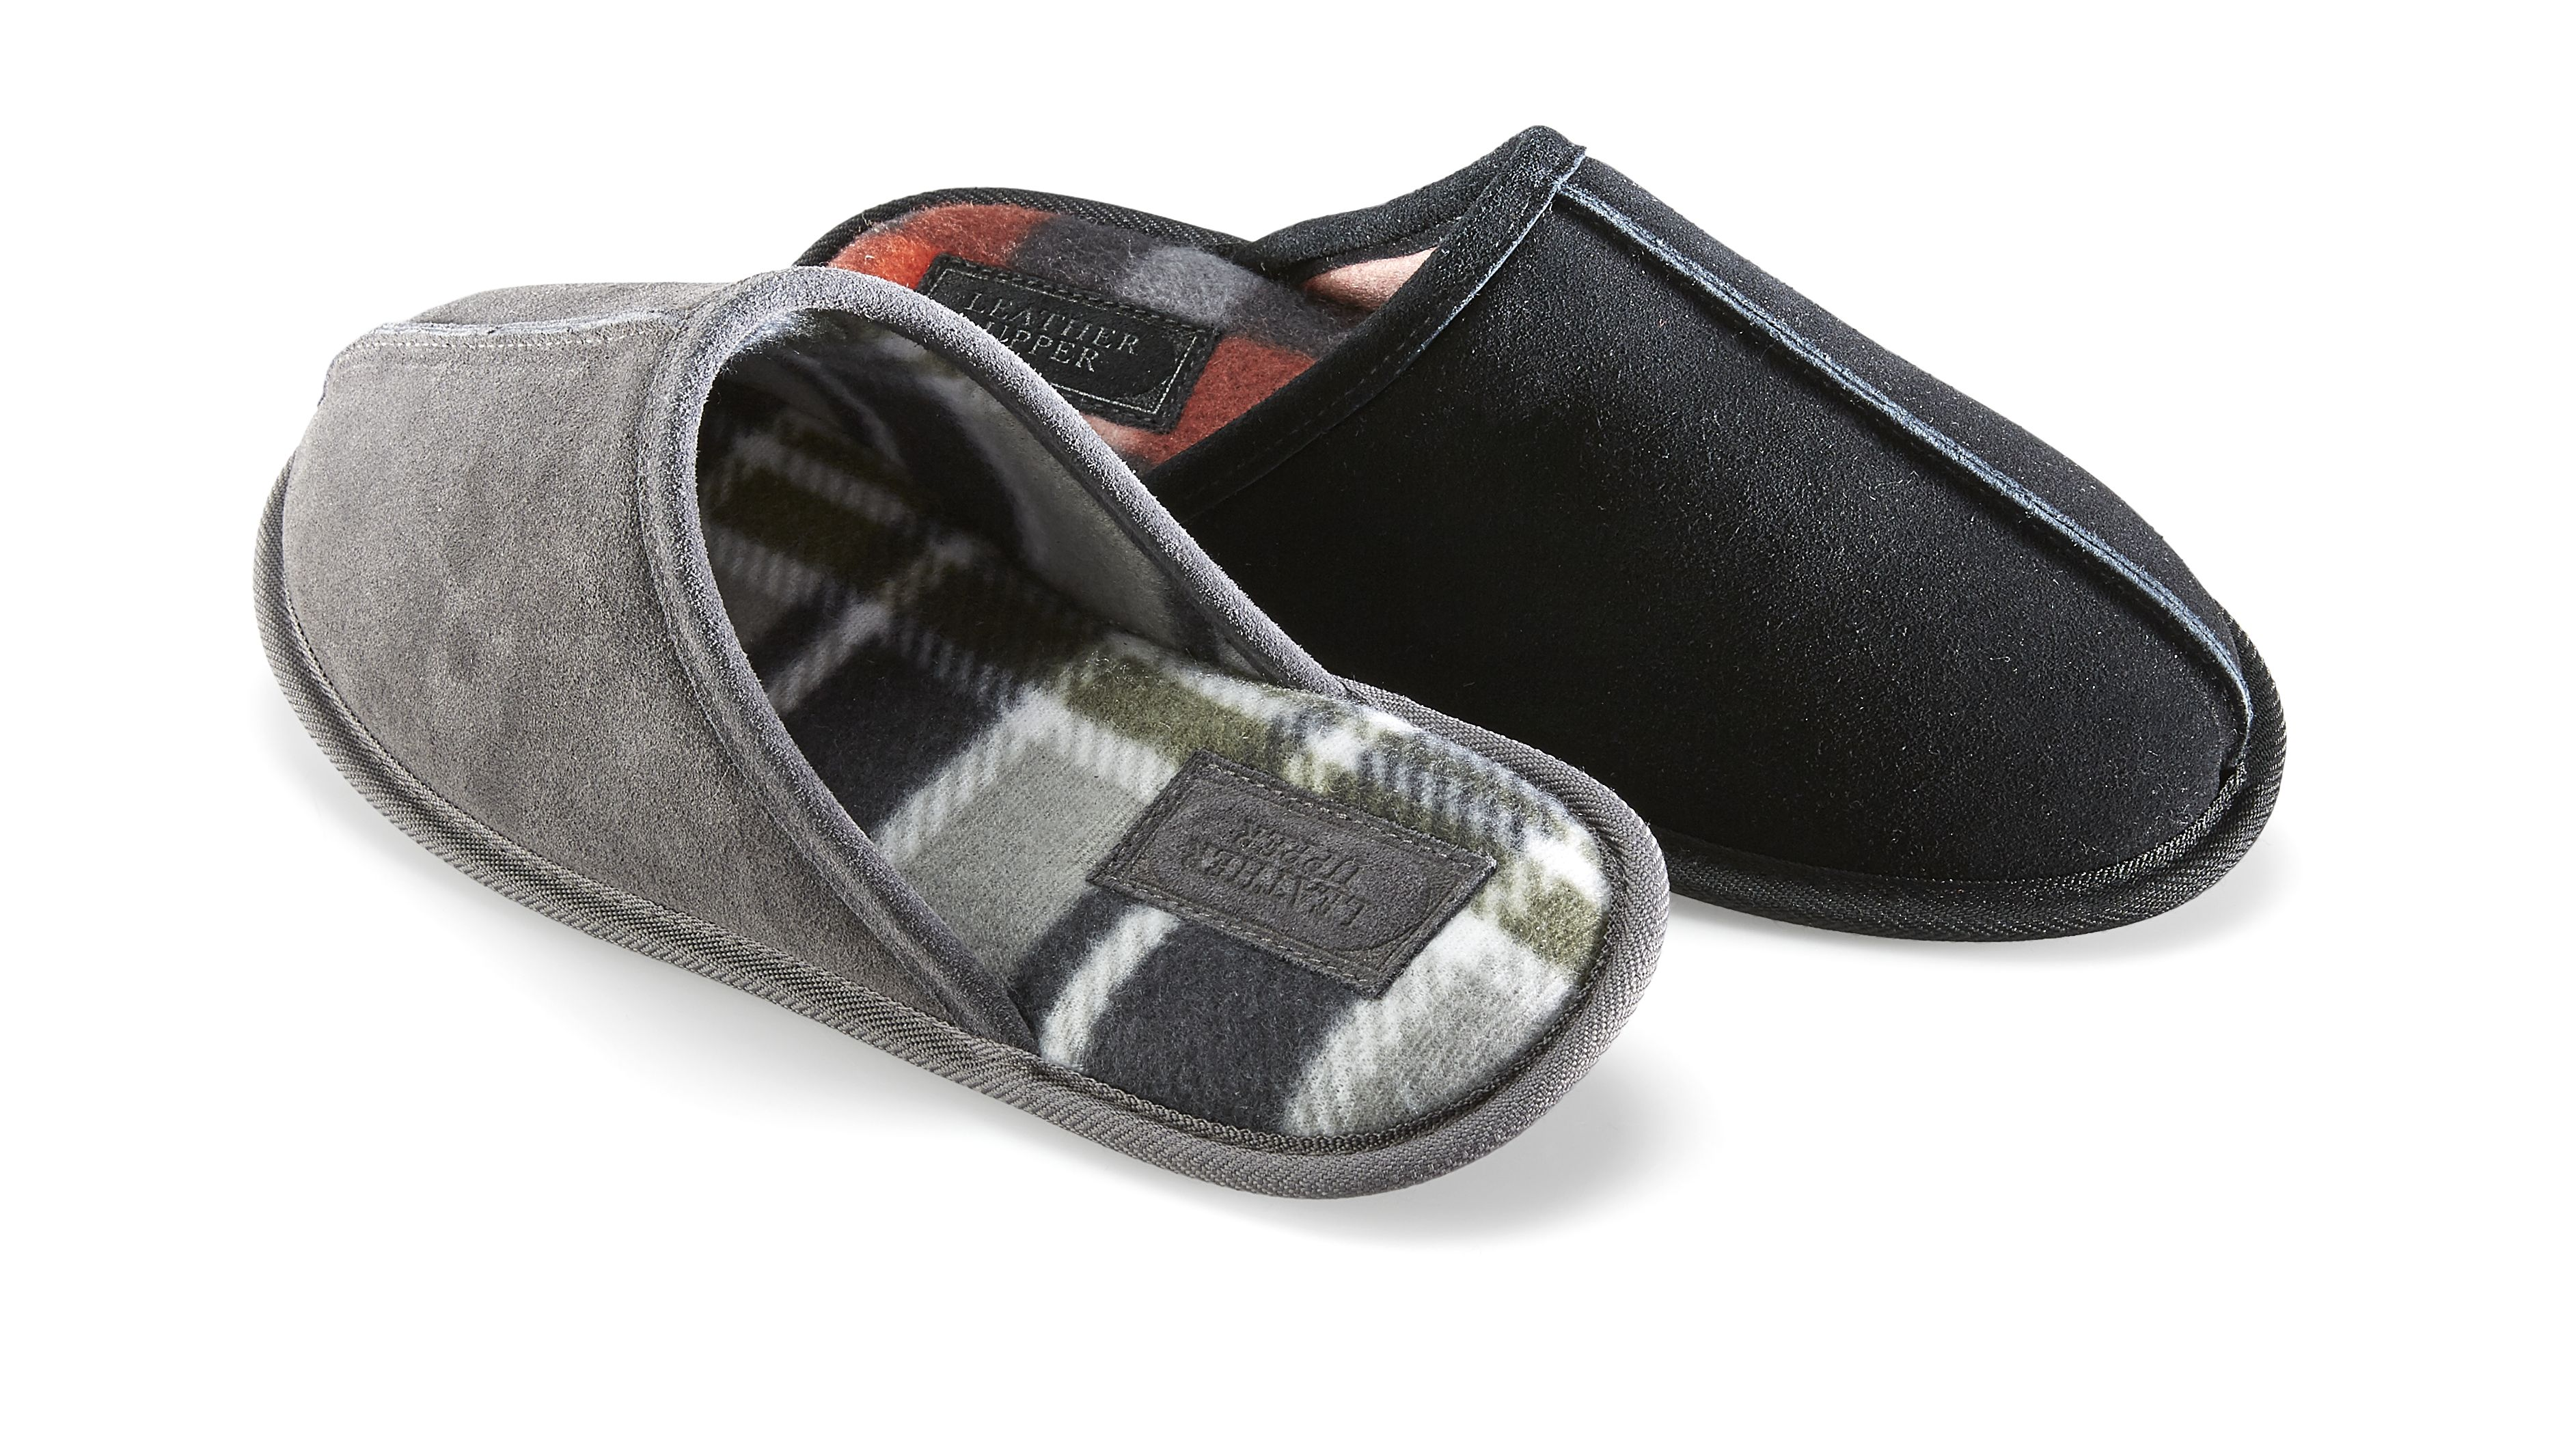 Kmart Men's Suede Slide Slippers, Size 7-13, RRP$17.00